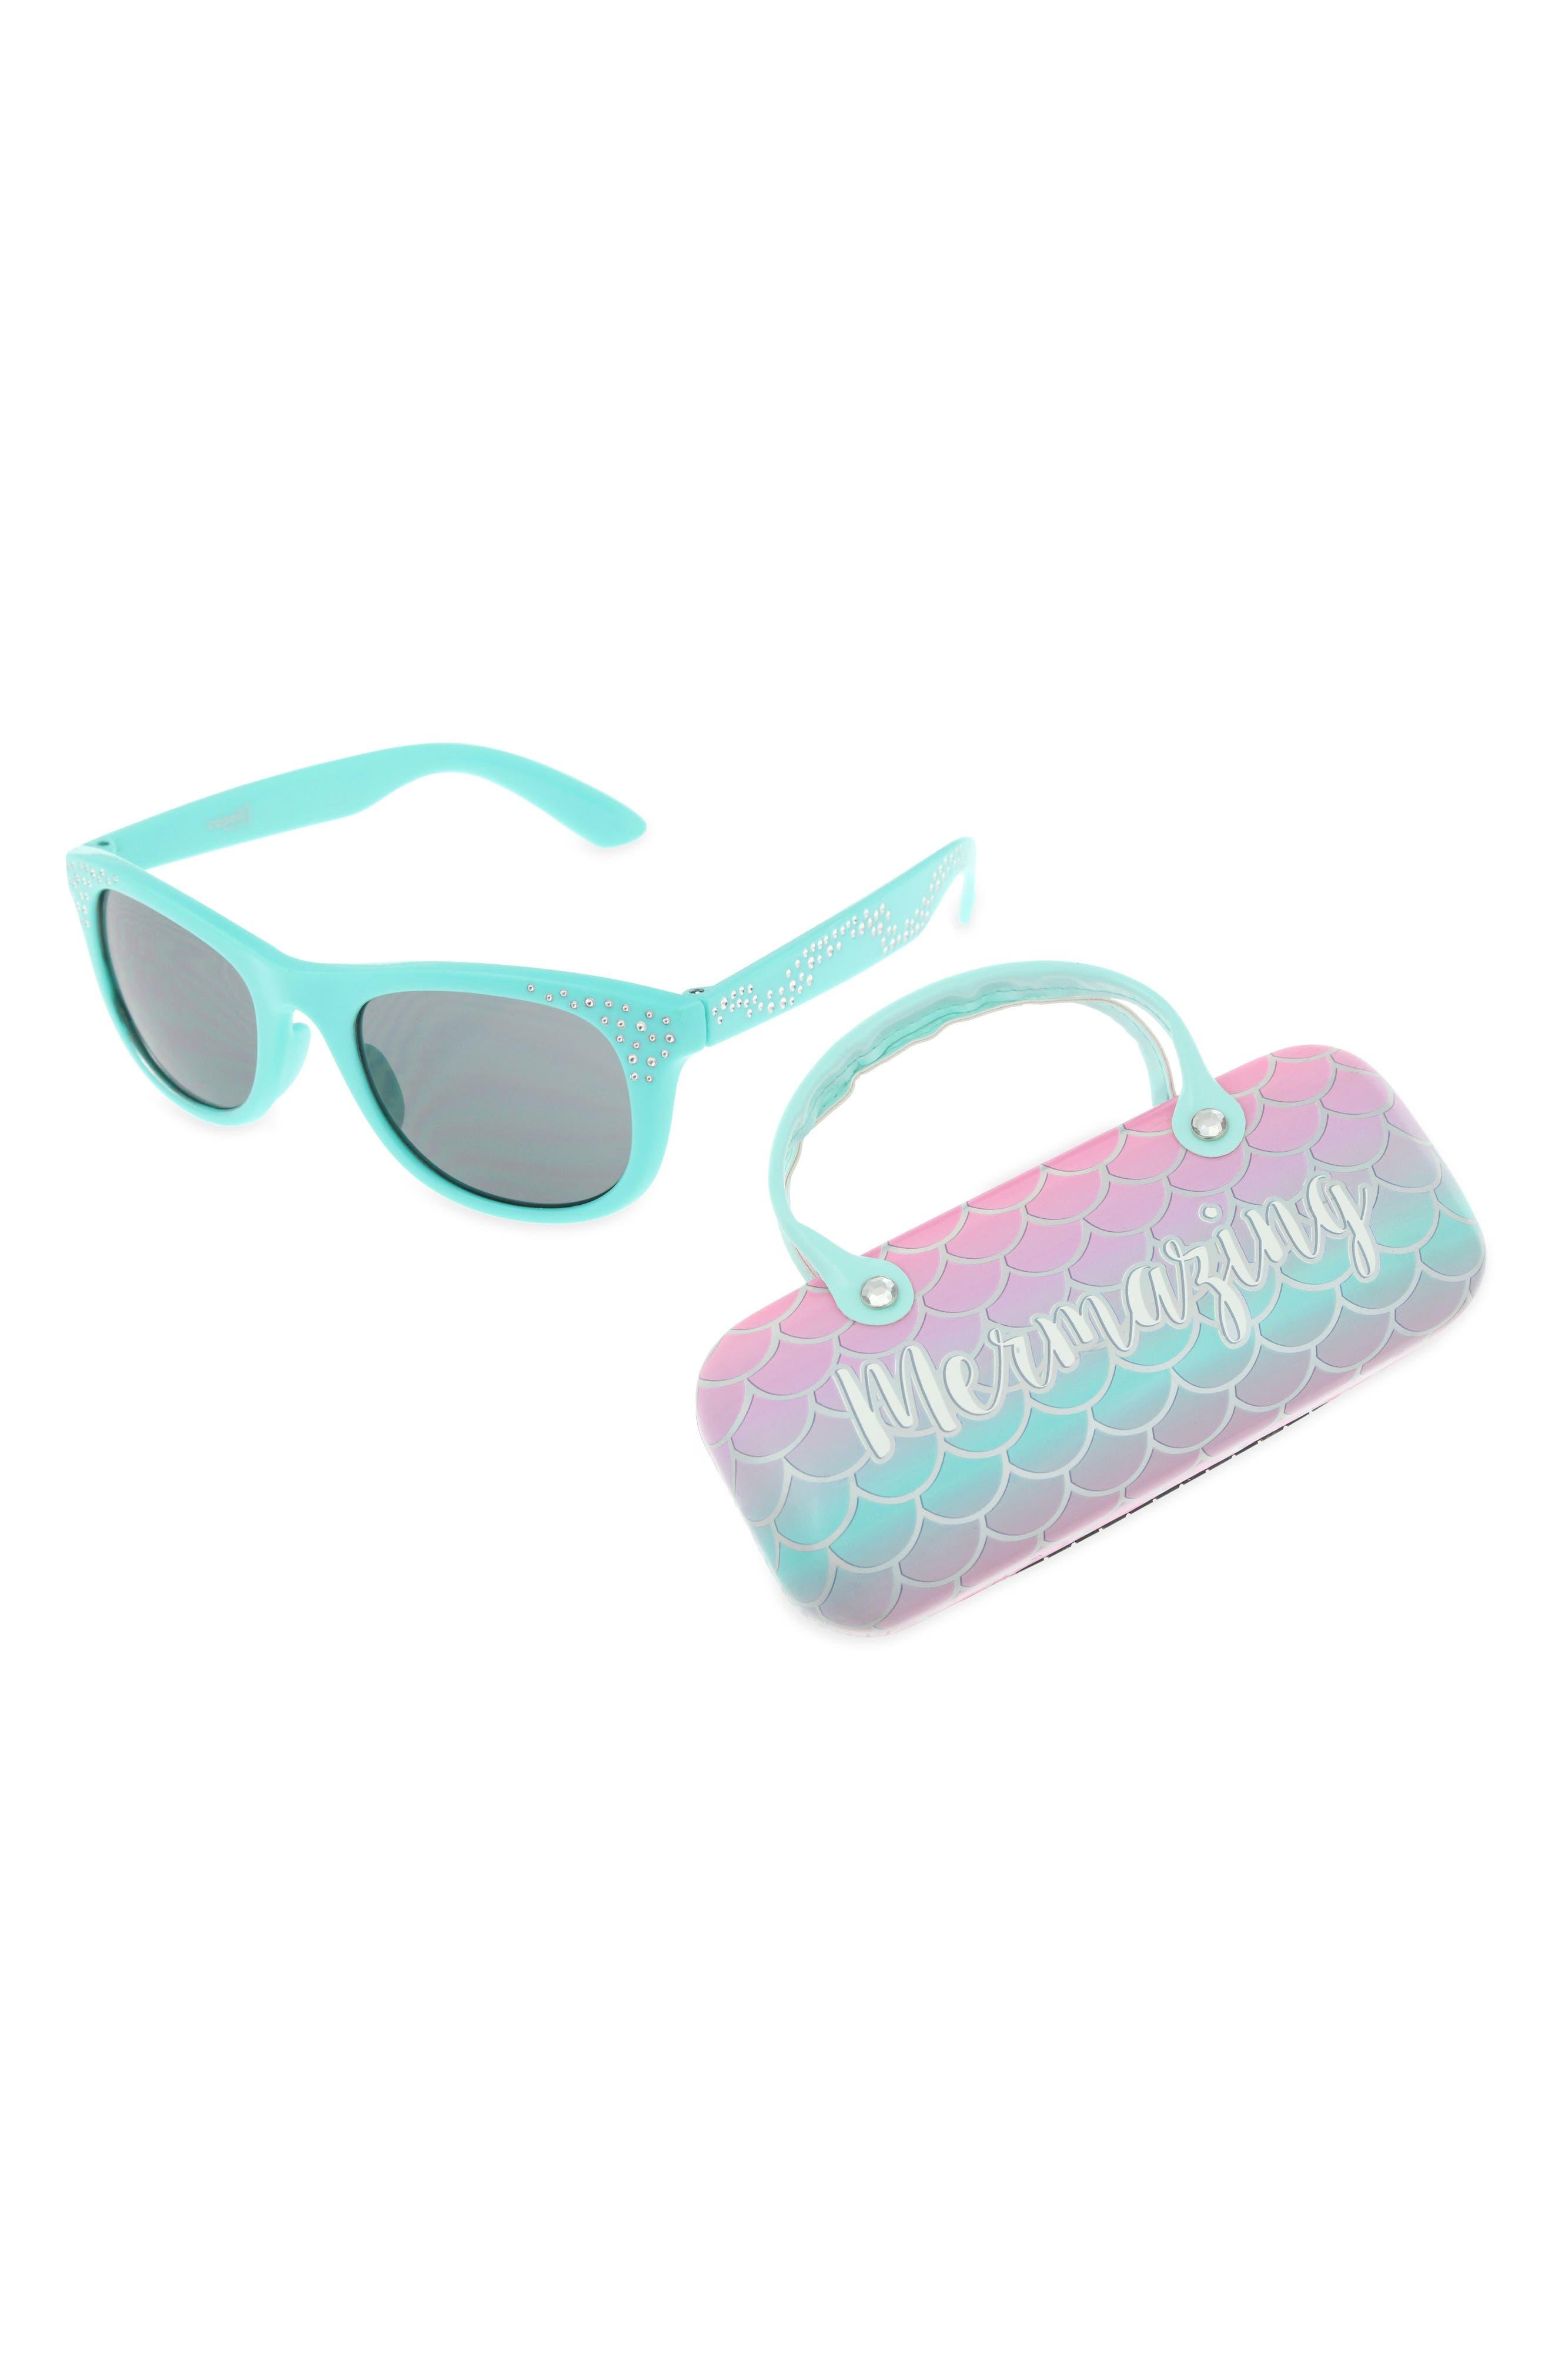 Mermazing 60mm Sunglasses & Case Set,                             Main thumbnail 1, color,                             Mint